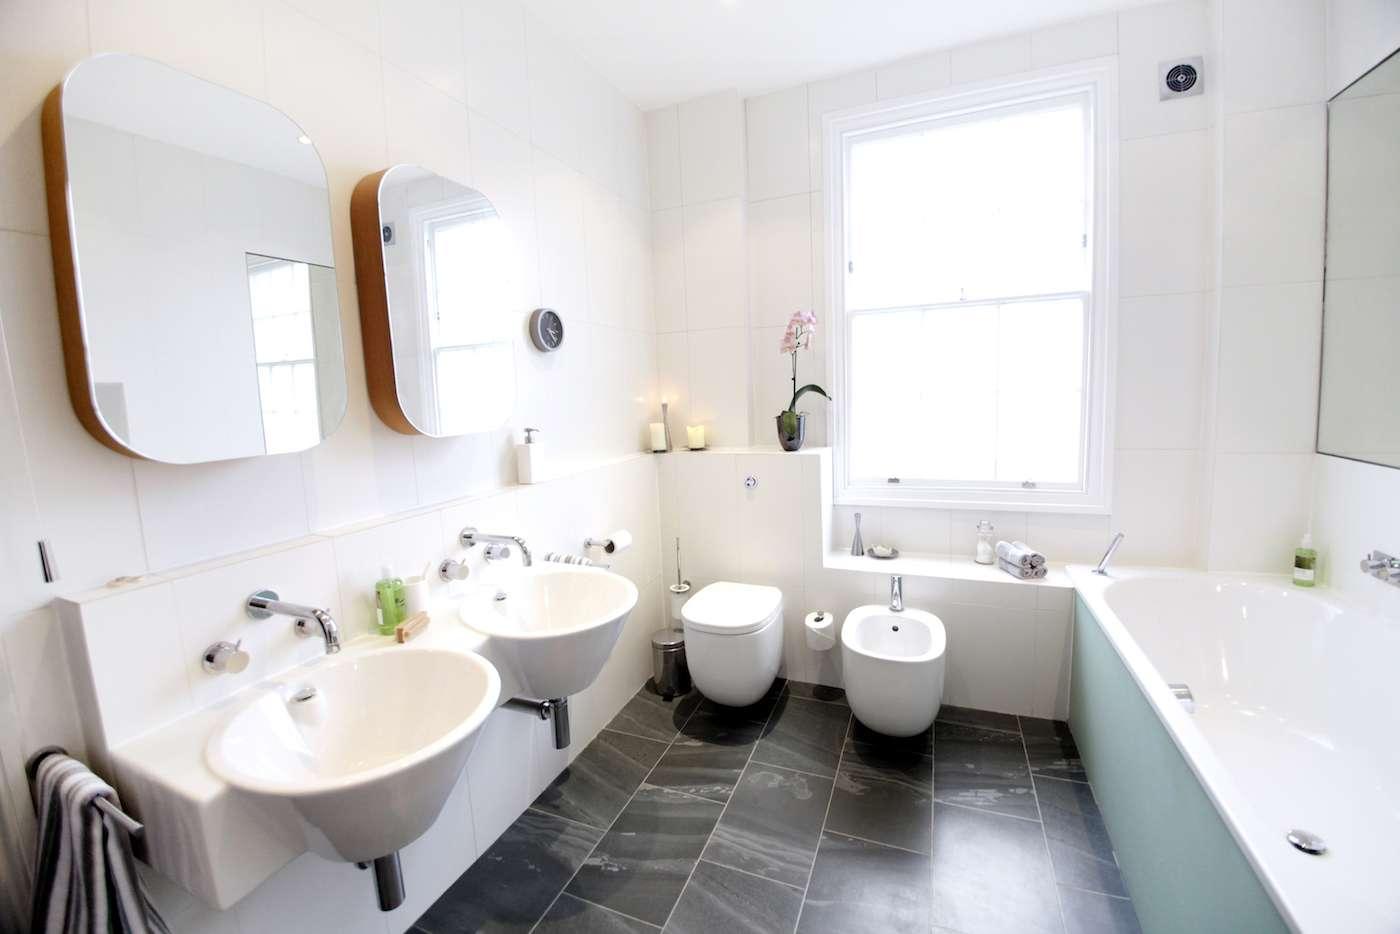 Architect designed mansard roof house extension Angel Islington N1 Bathroom design Mansard roof extensions in London | Home ideas